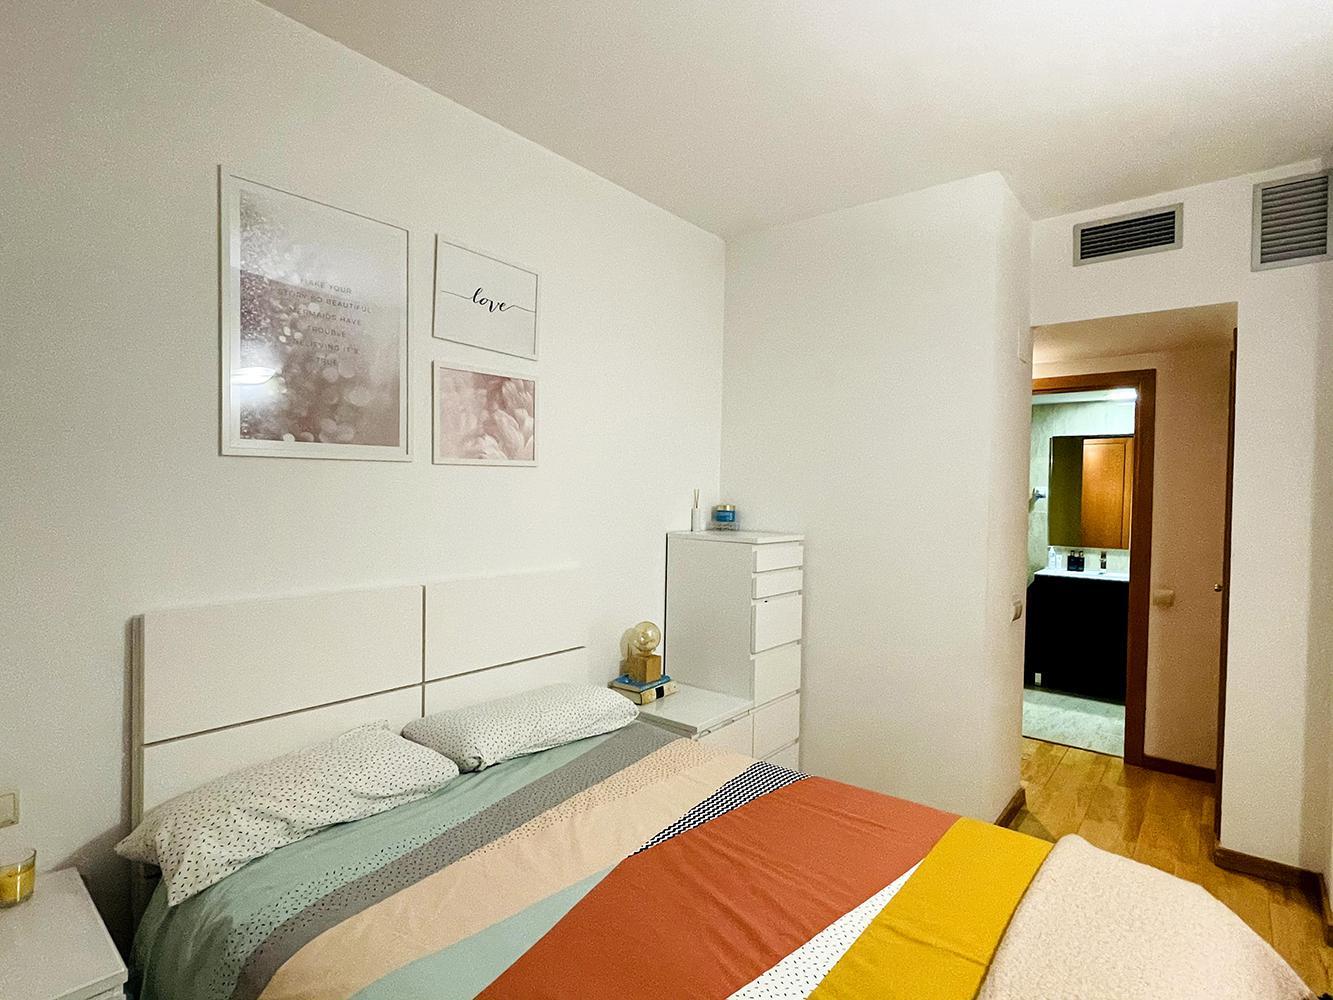 Imagen 1 Piso en alquiler en Barcelona / Pere iv con Bilbao